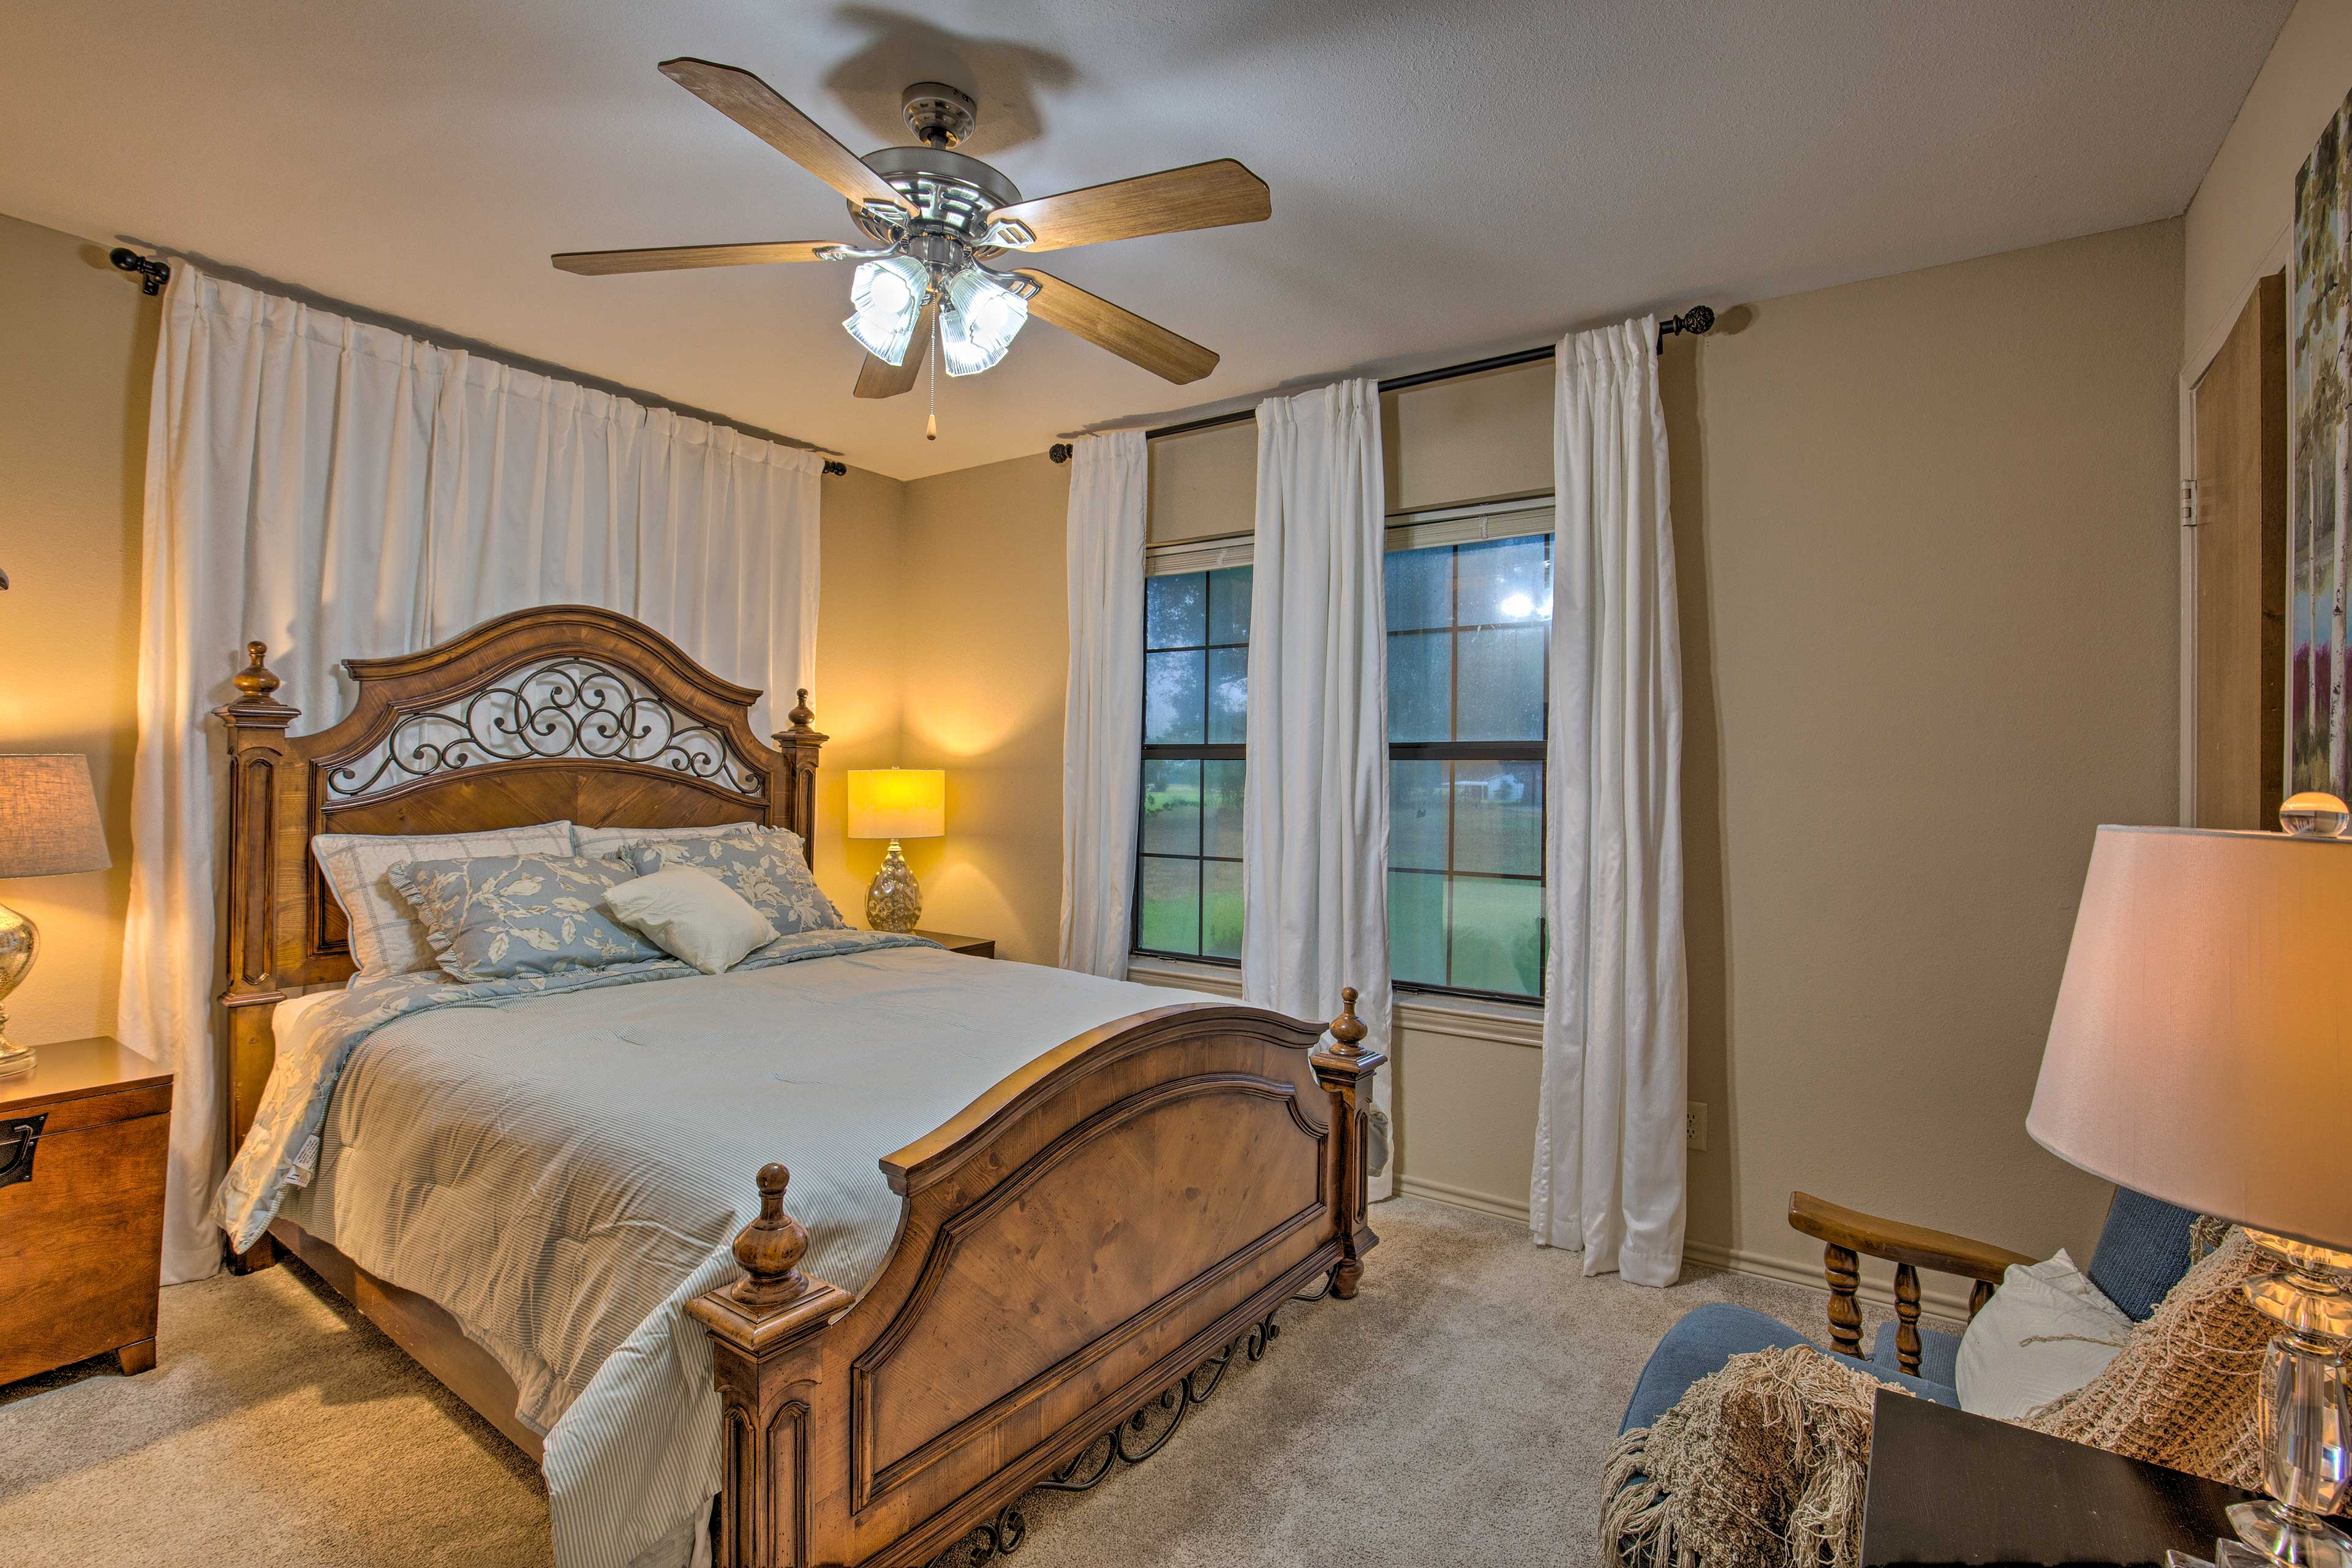 The master bedroom features a queen bed and an en-suite bathroom.